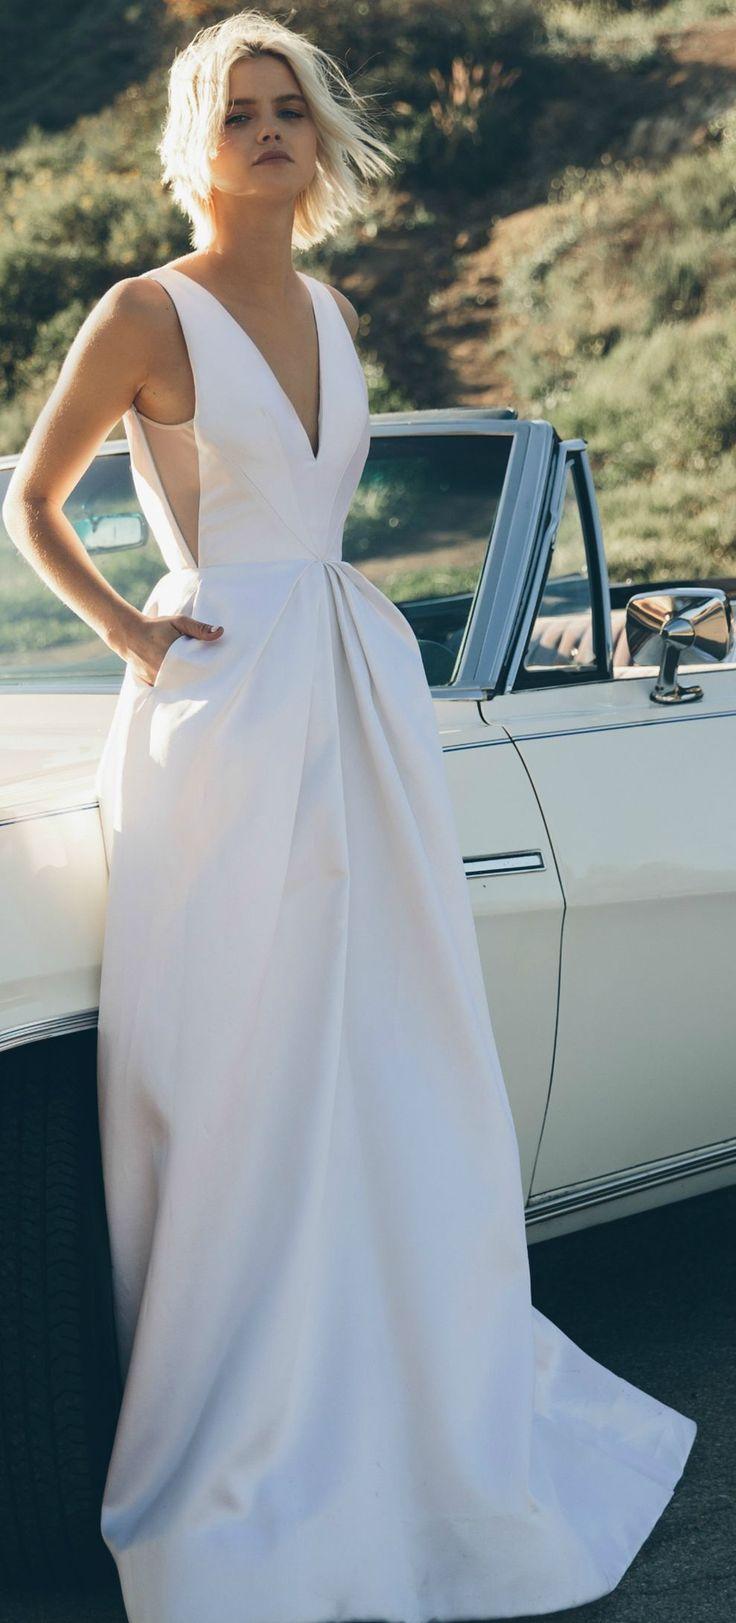 24 best sarah seven images on Pinterest | Homecoming dresses straps ...